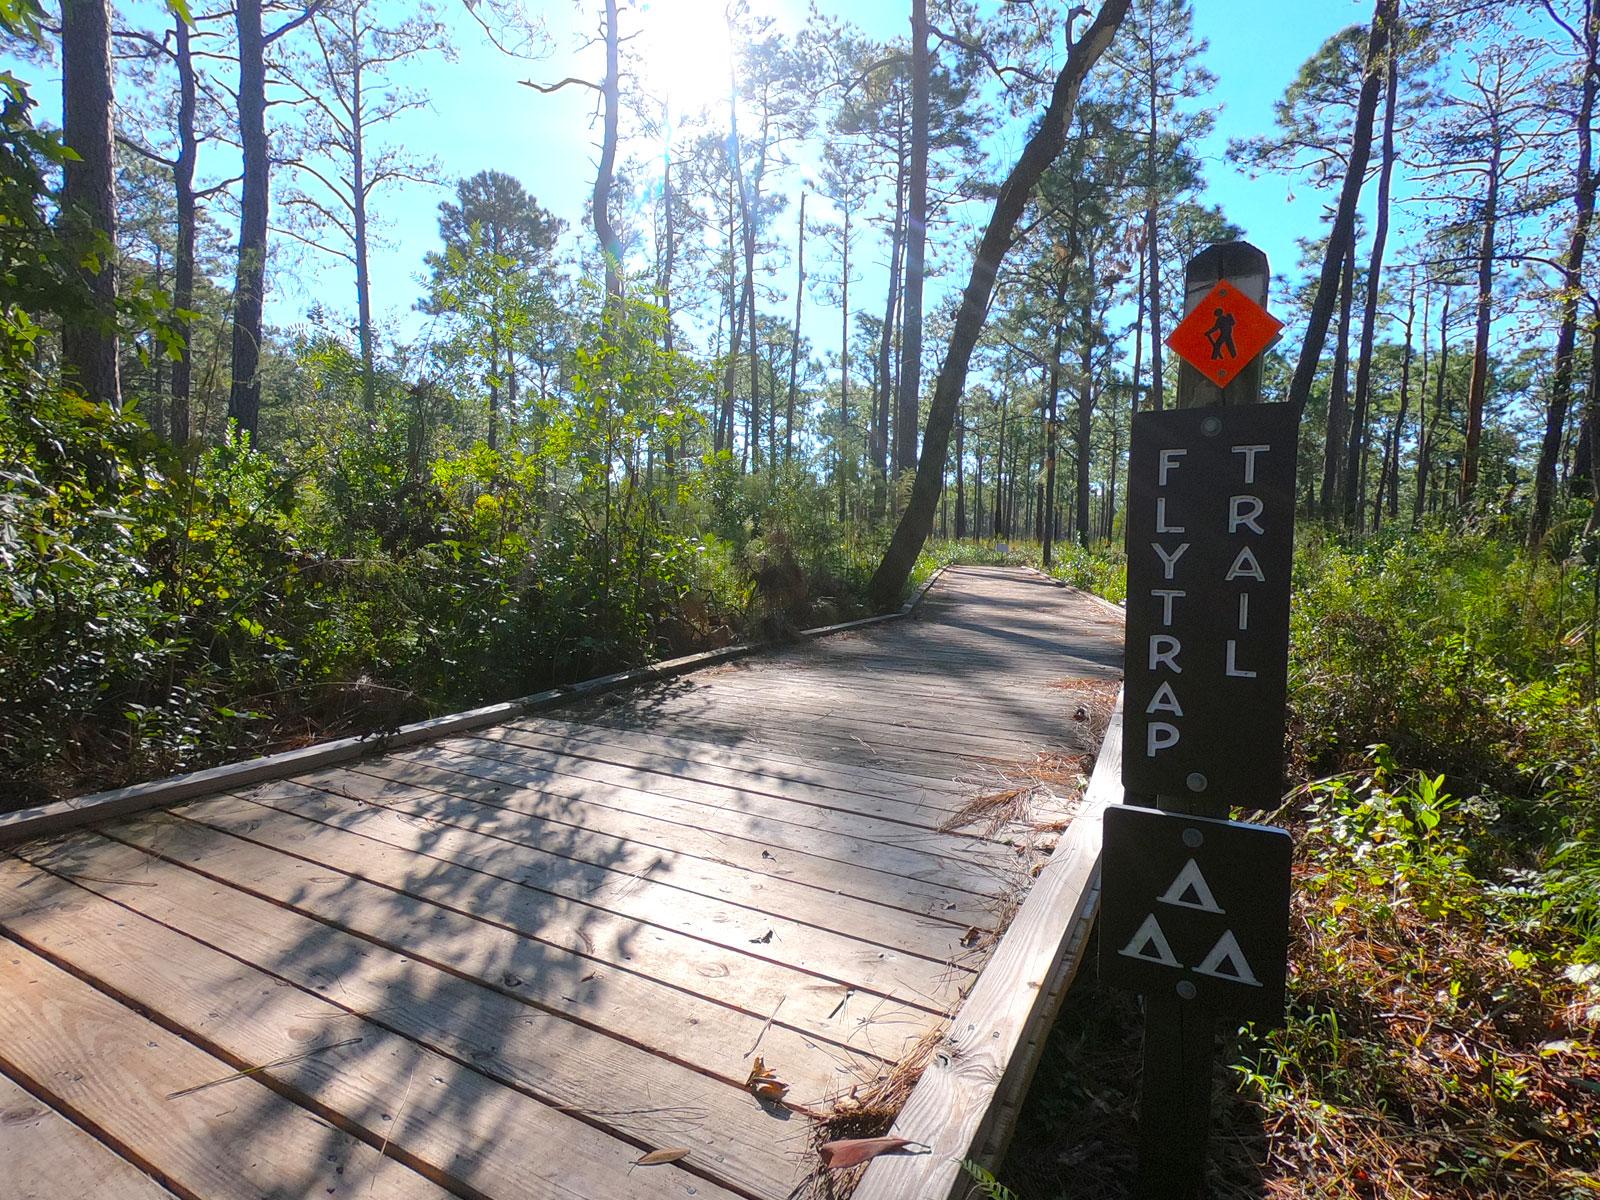 Boardwalk along the Flytrap Trail at Carolina Beach State Park in North Carolina